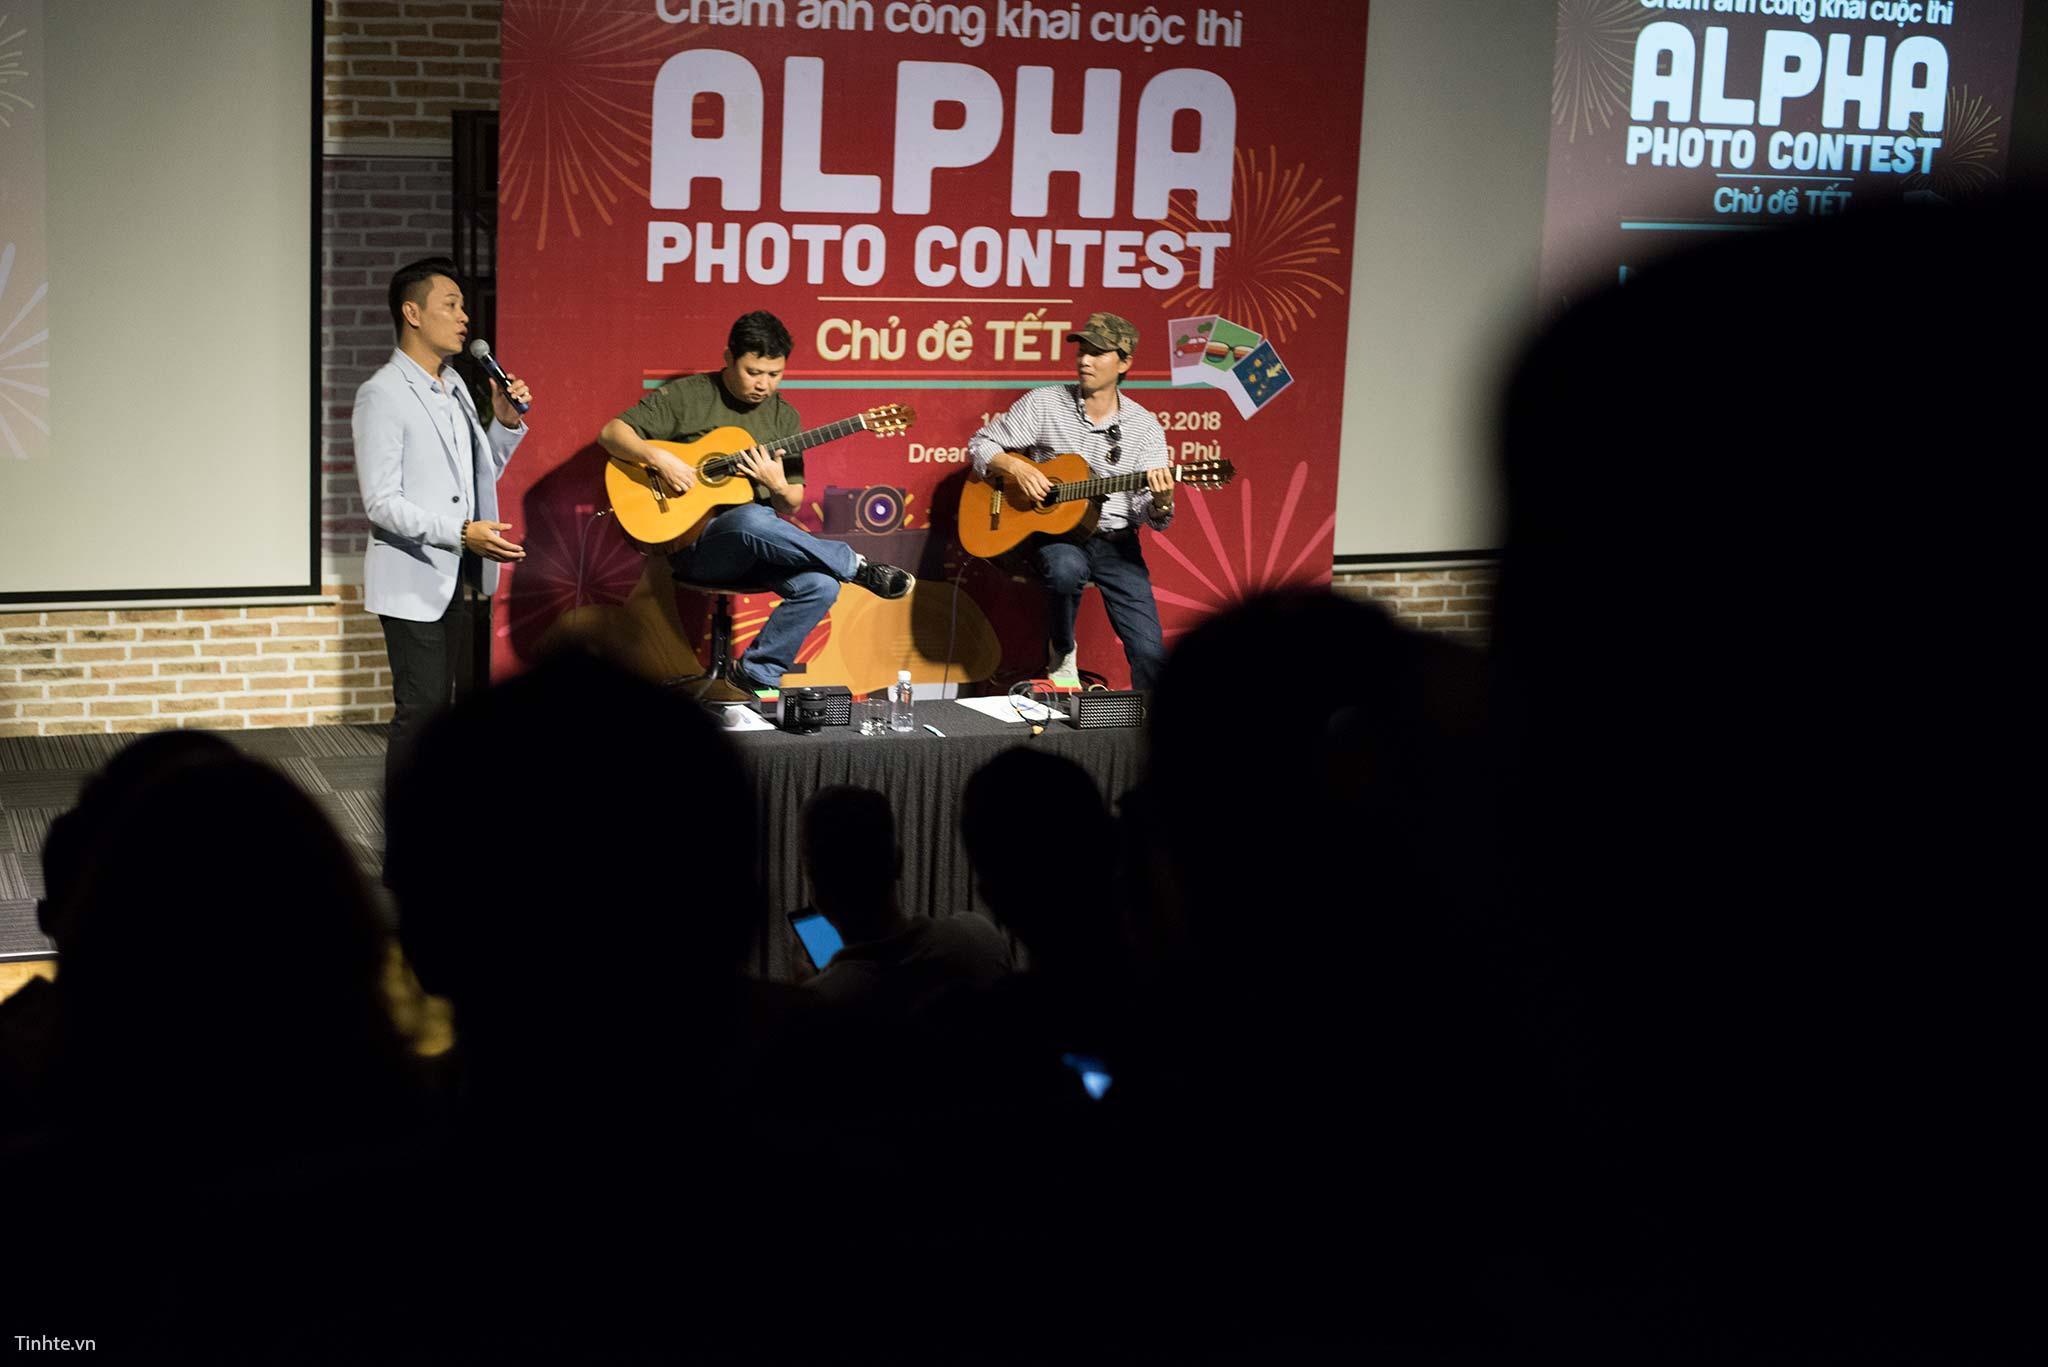 alphaphotocontest-camera.tinhte.vn-45.jpg